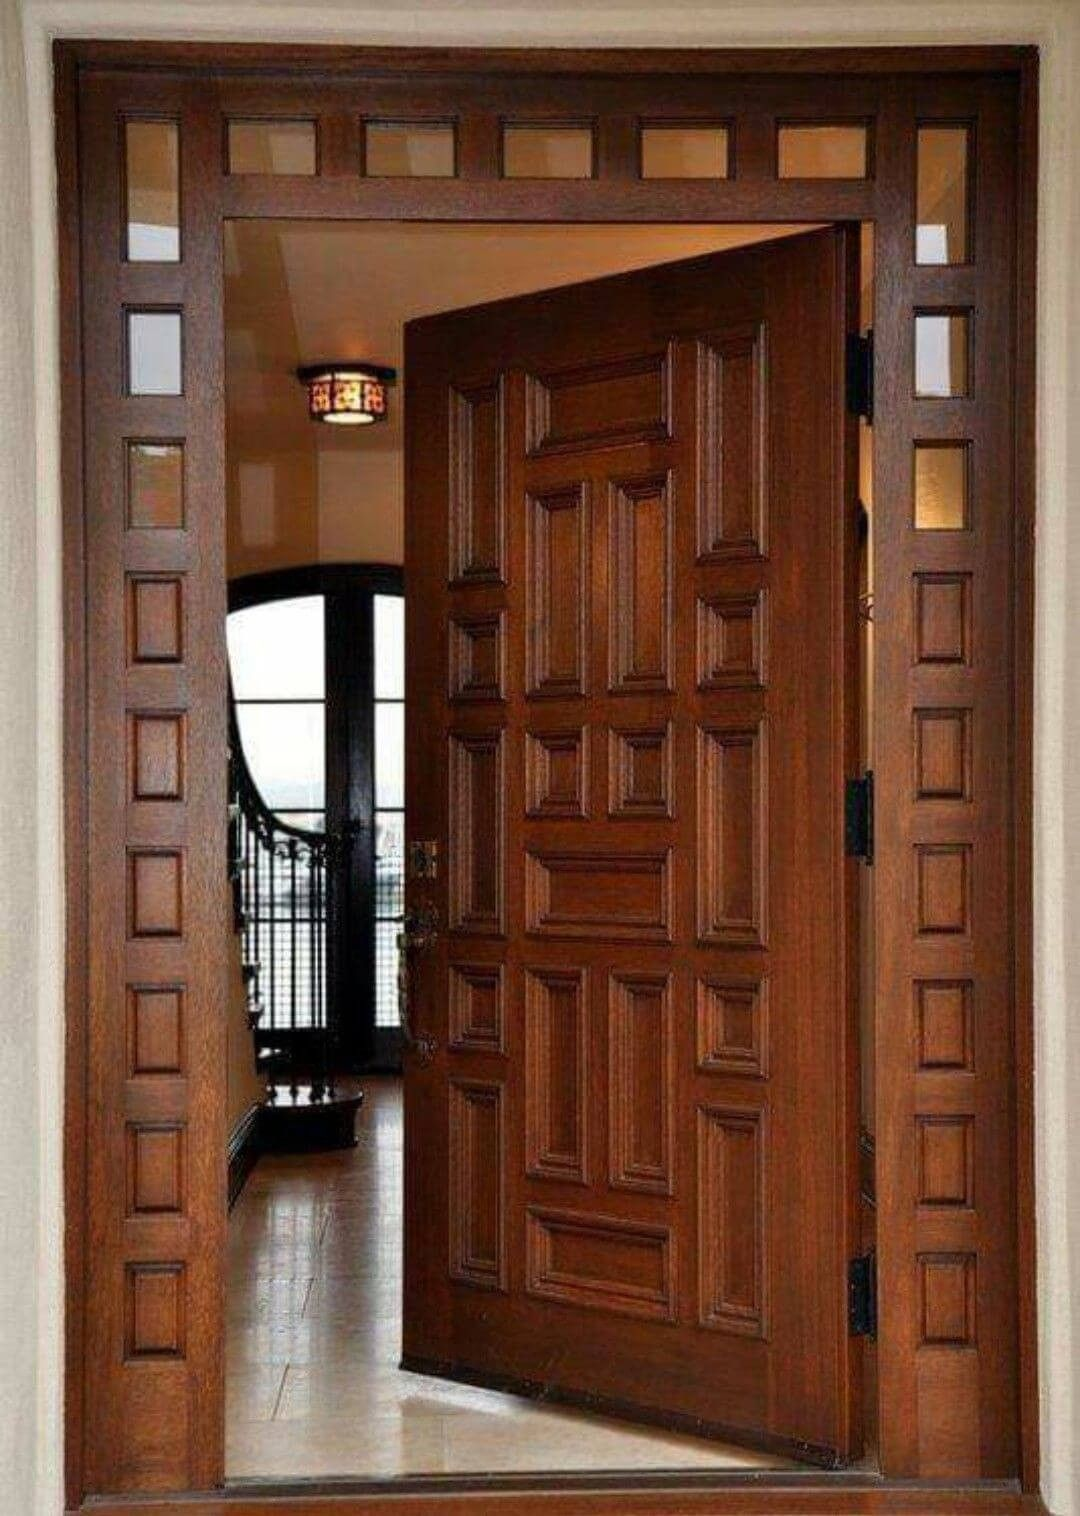 Unique 50 Modern And Classic Wooden Main Door Design Ideas To See More Visit Door Design Modern Entry Door Designs Main Door Design